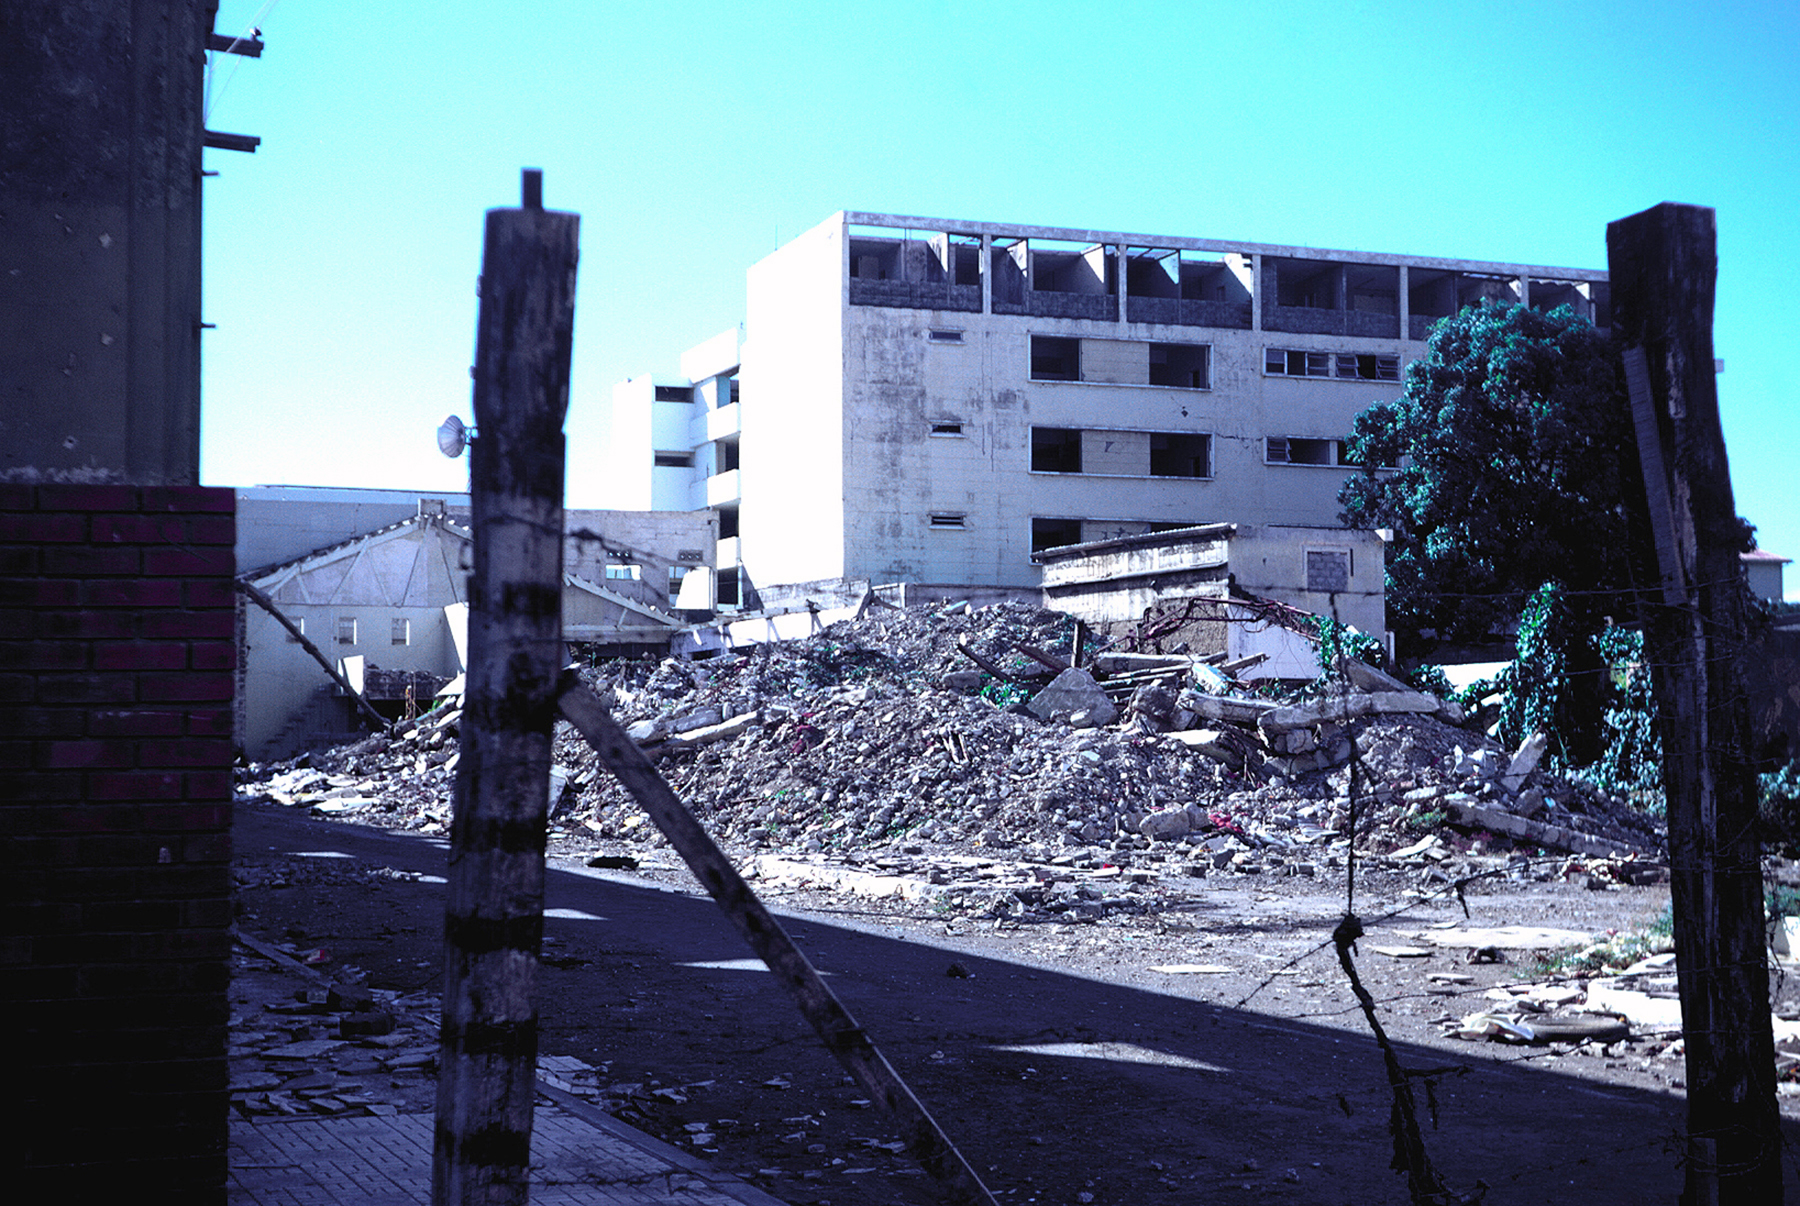 Earthquake damage in Nicaragua